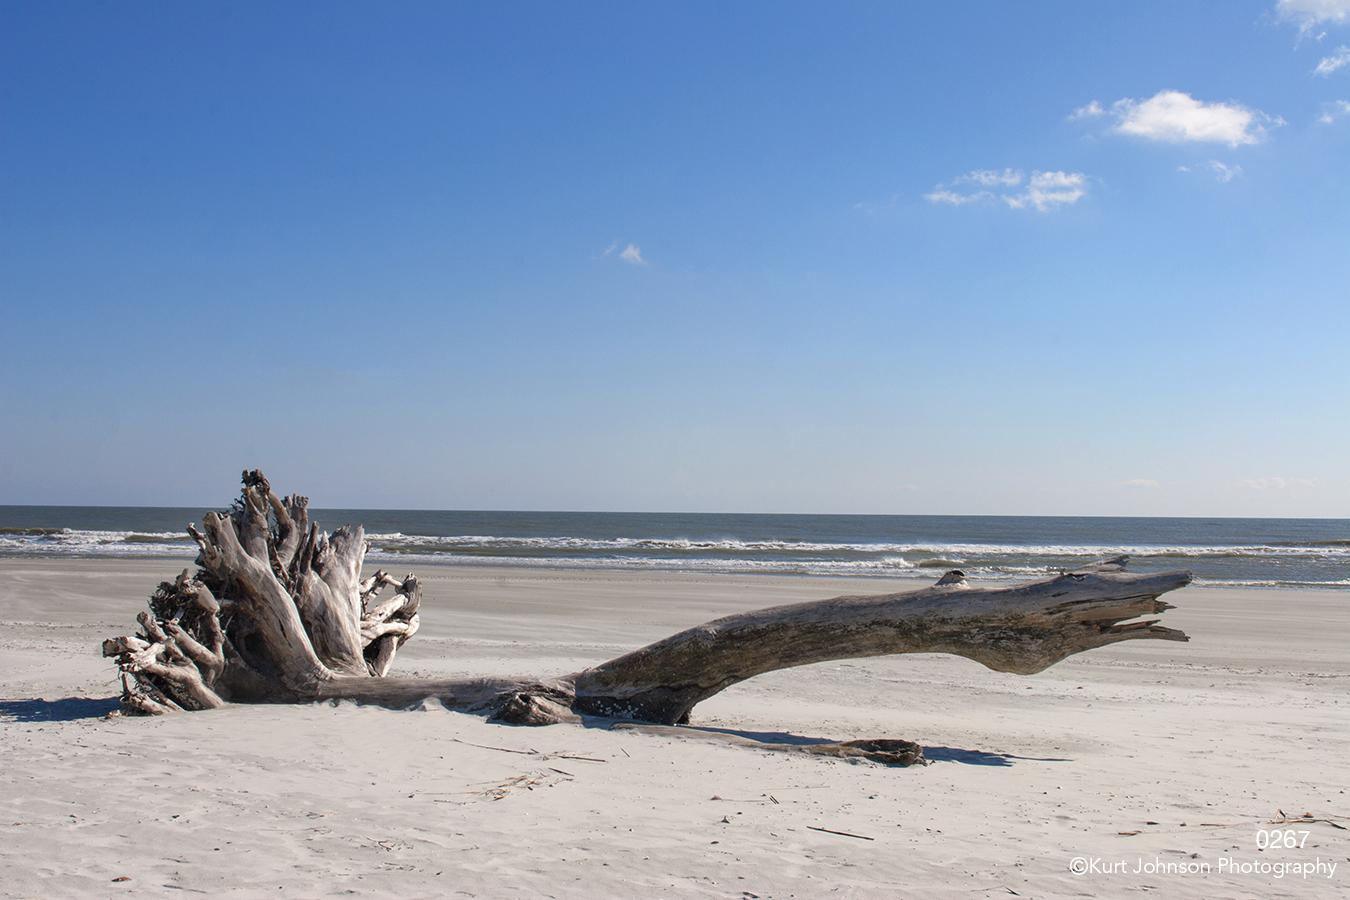 waterscape beach landscape waves sky wood driftwood